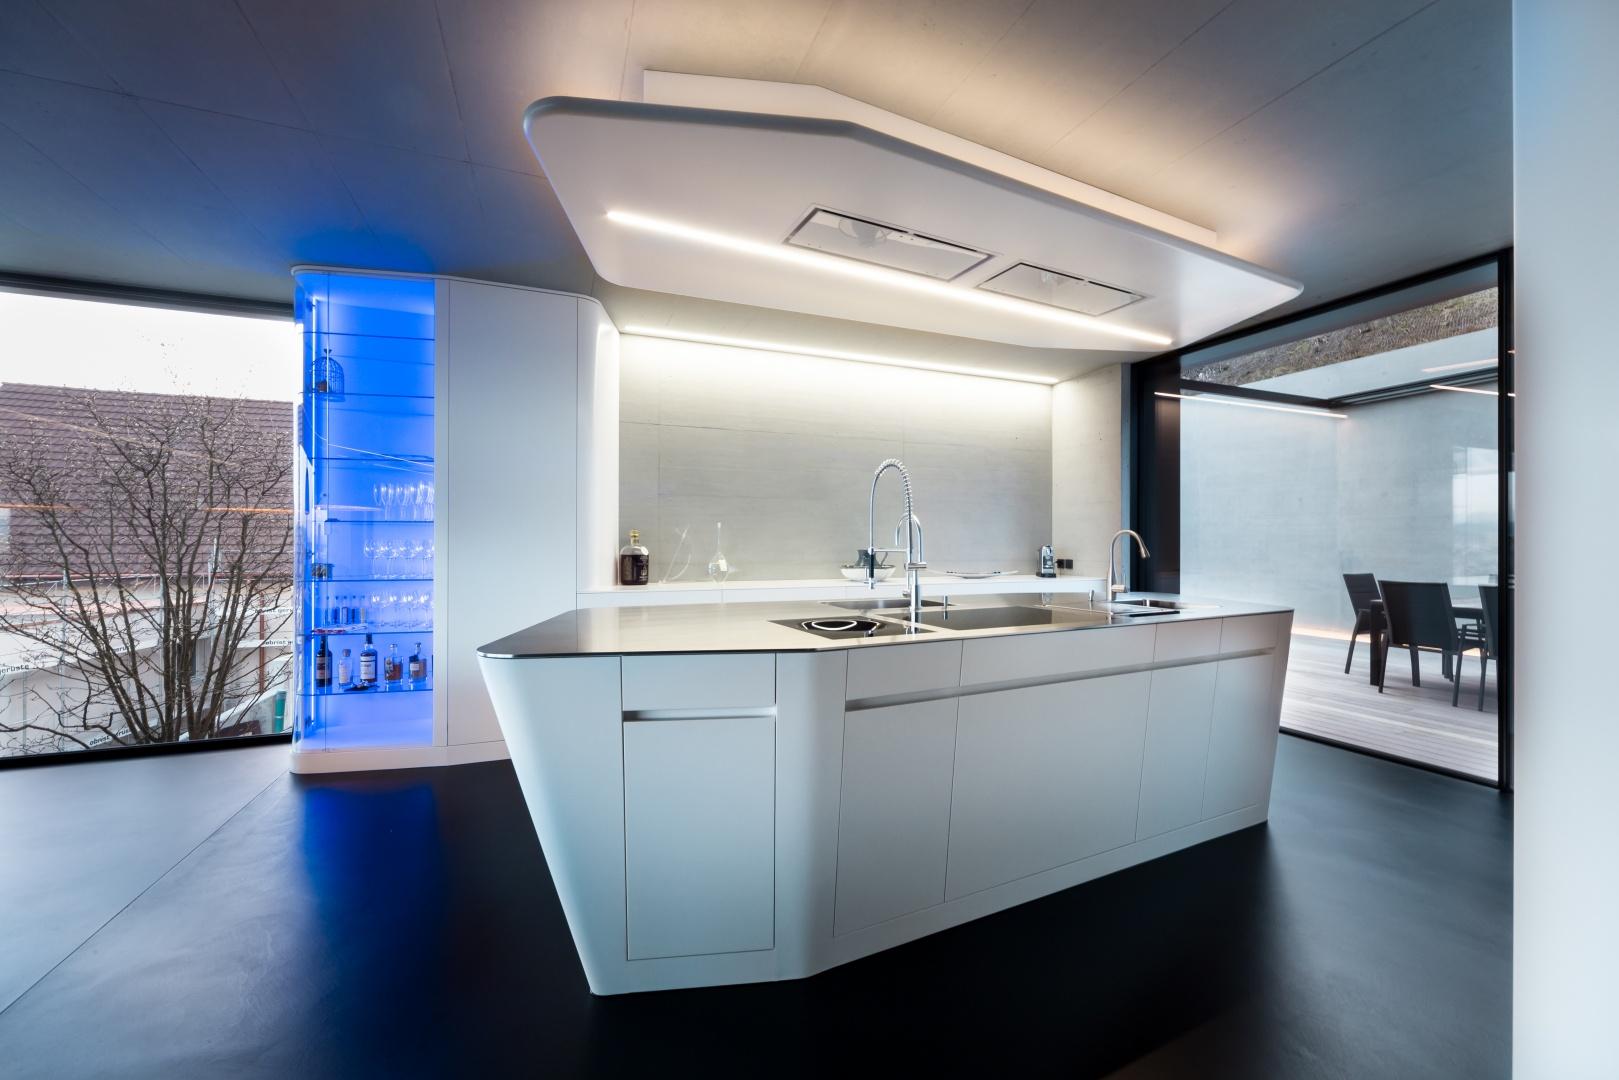 Küche © Lämmli Architektur AG, 5000 Aarau